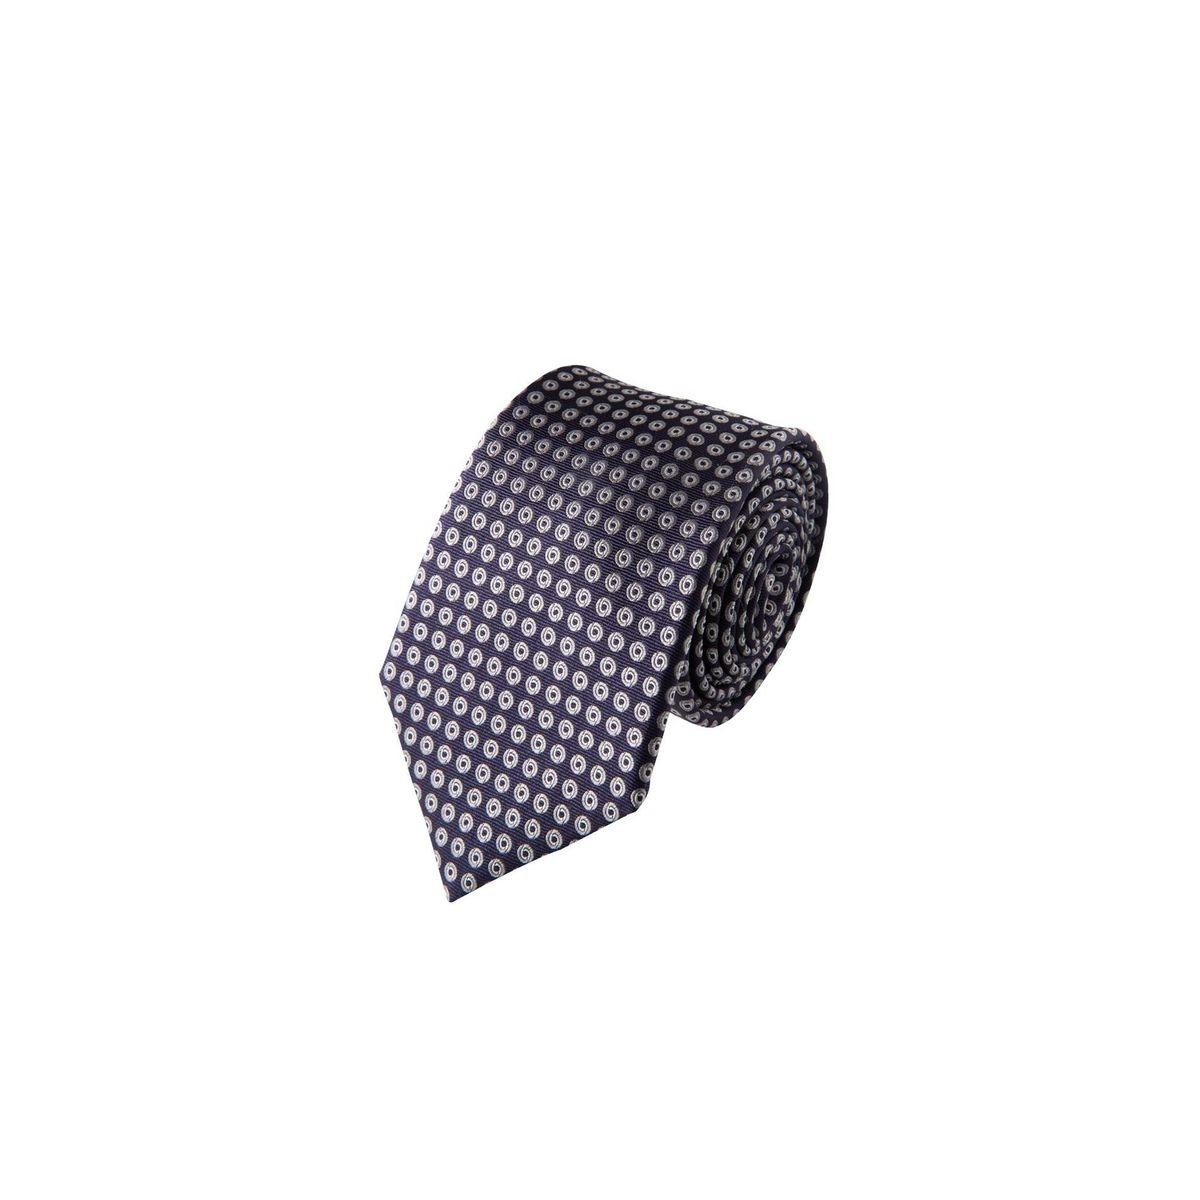 Cravate motifs ronds en soie, Made in France